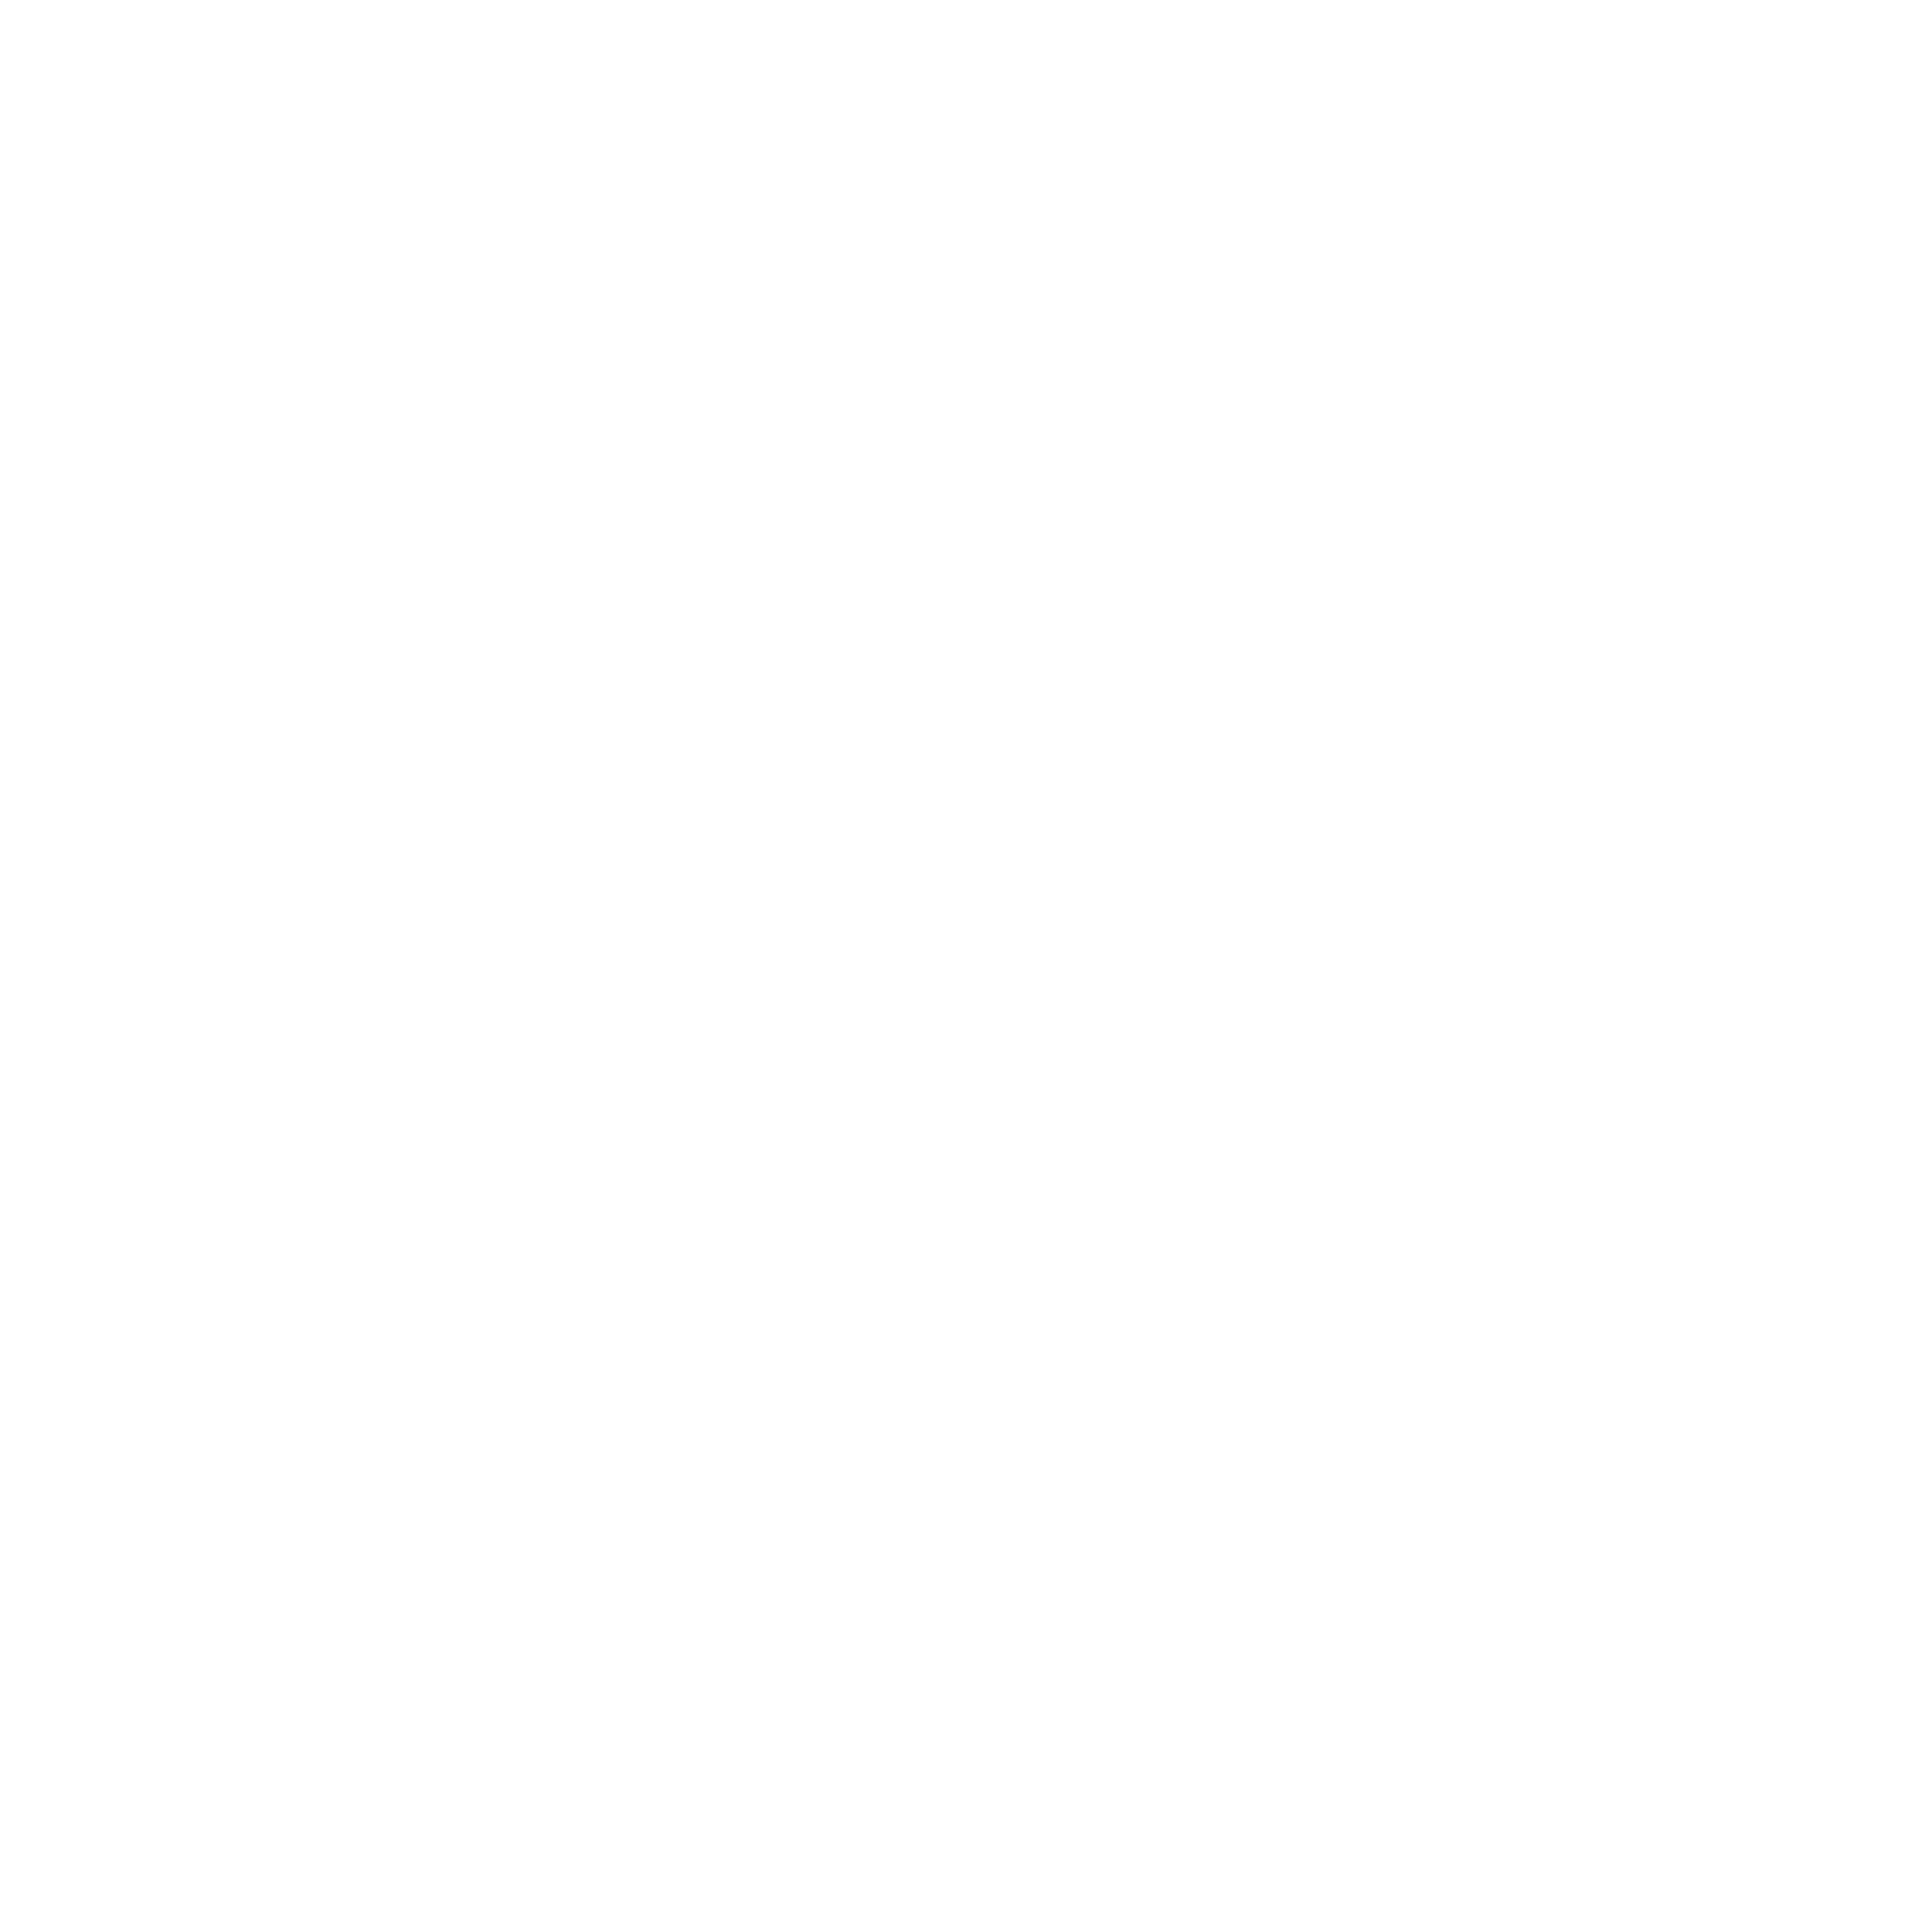 Logo Uta Plehwe weiß